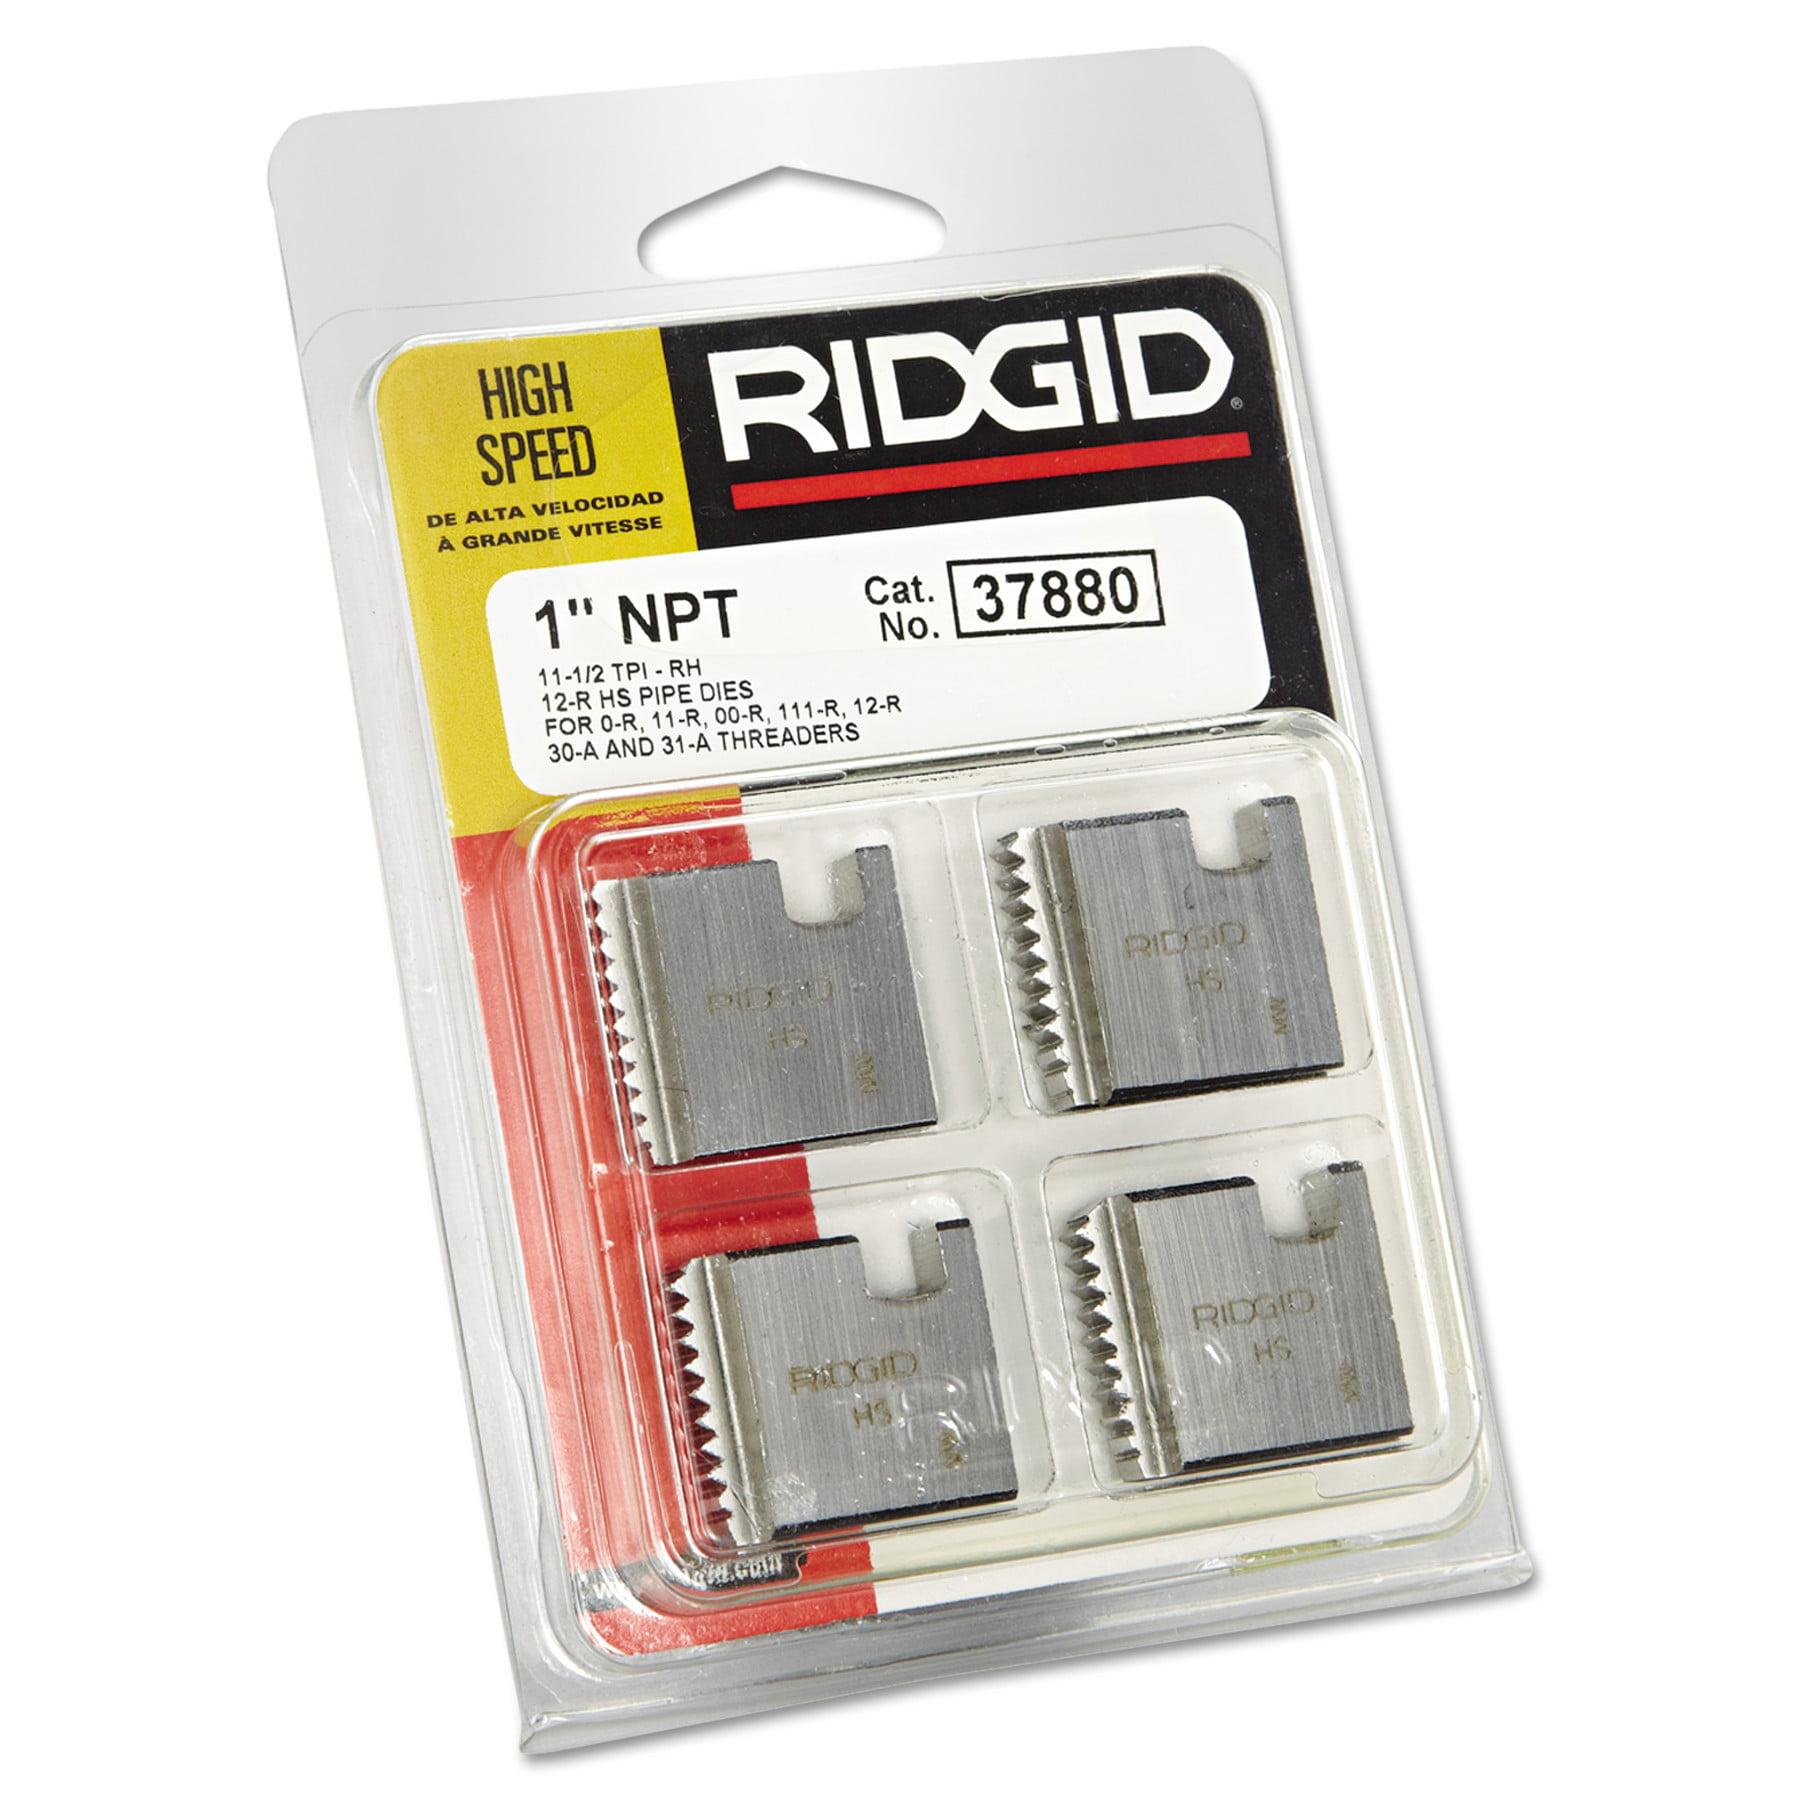 RIDGID High-Speed RH Manual Threader Pipe u0026 Bolt Die NPT 1  - 11 1/2 TPI - Walmart.com  sc 1 st  Walmart & RIDGID High-Speed RH Manual Threader Pipe u0026 Bolt Die NPT 1